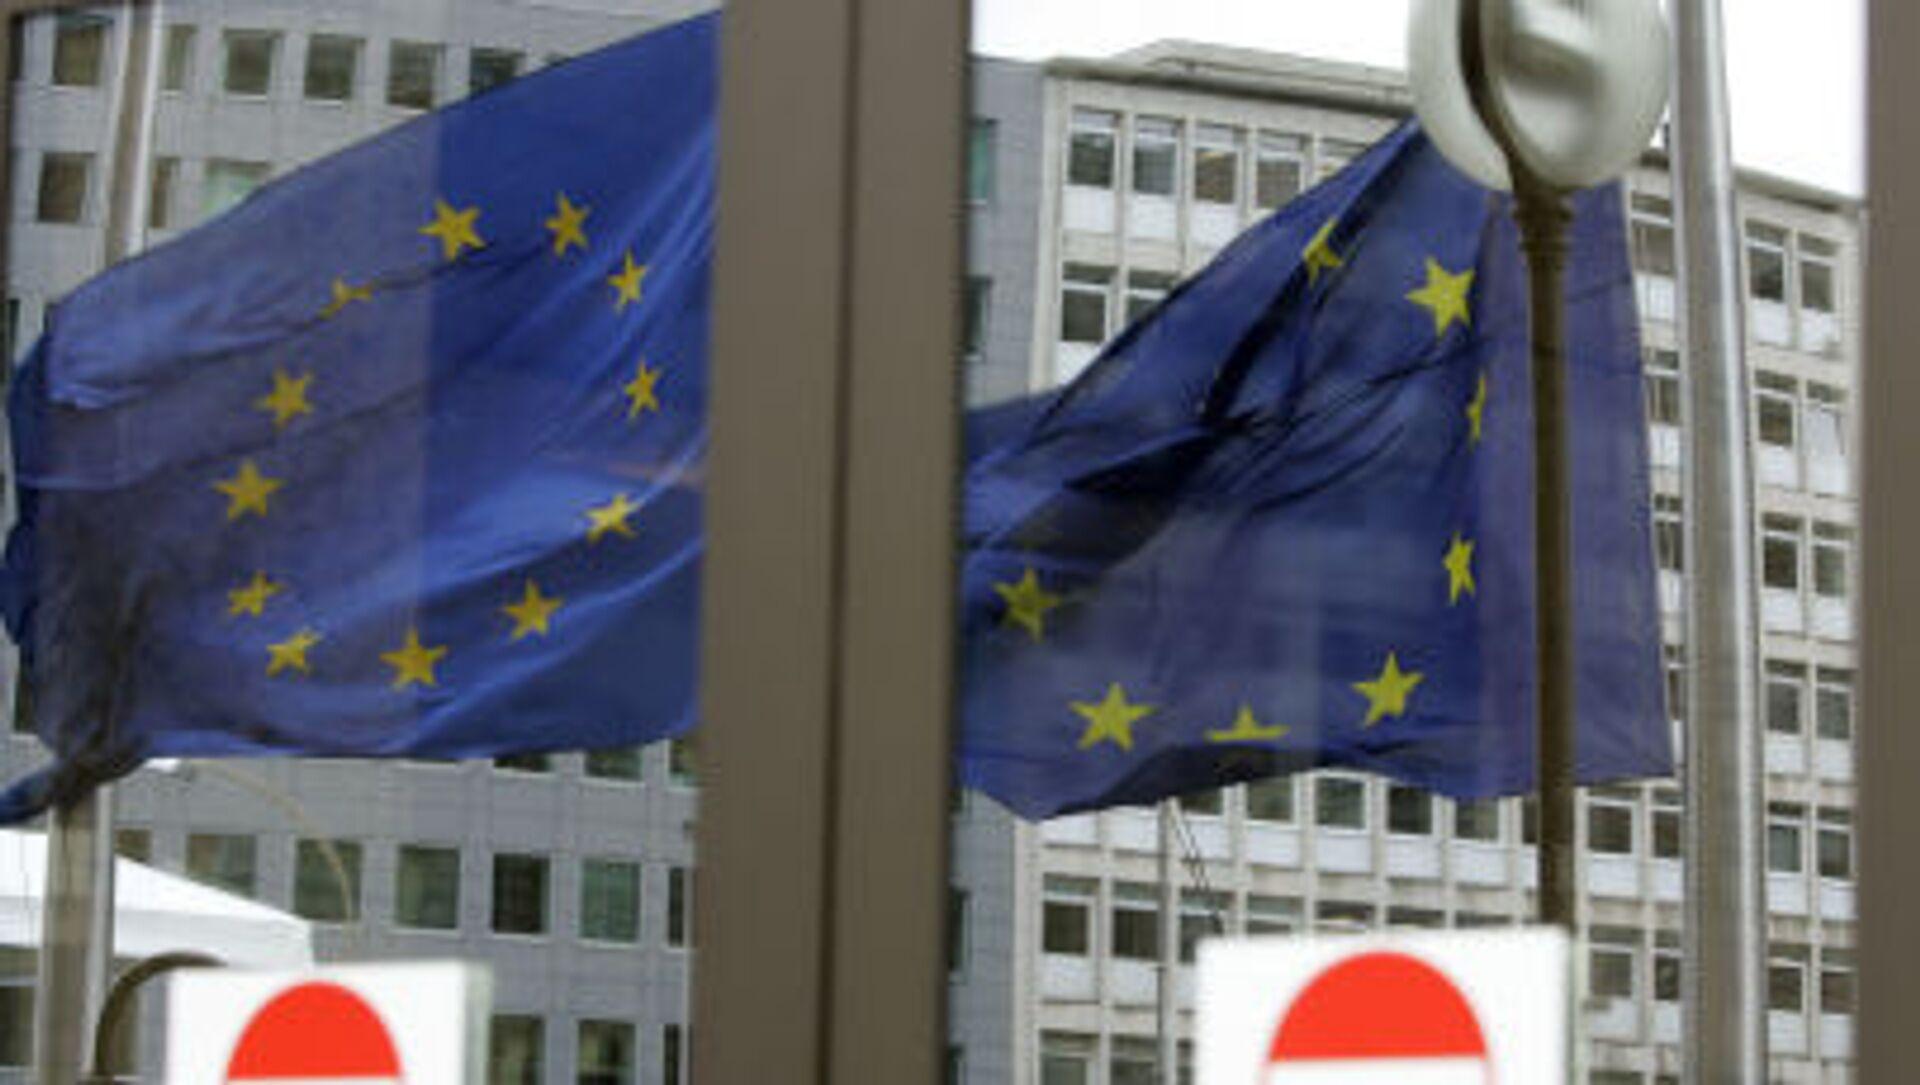 EU首脳、加盟国領空のベラルーシ機飛行禁止を決定 緊急着陸事件の制裁 - Sputnik 日本, 1920, 25.05.2021